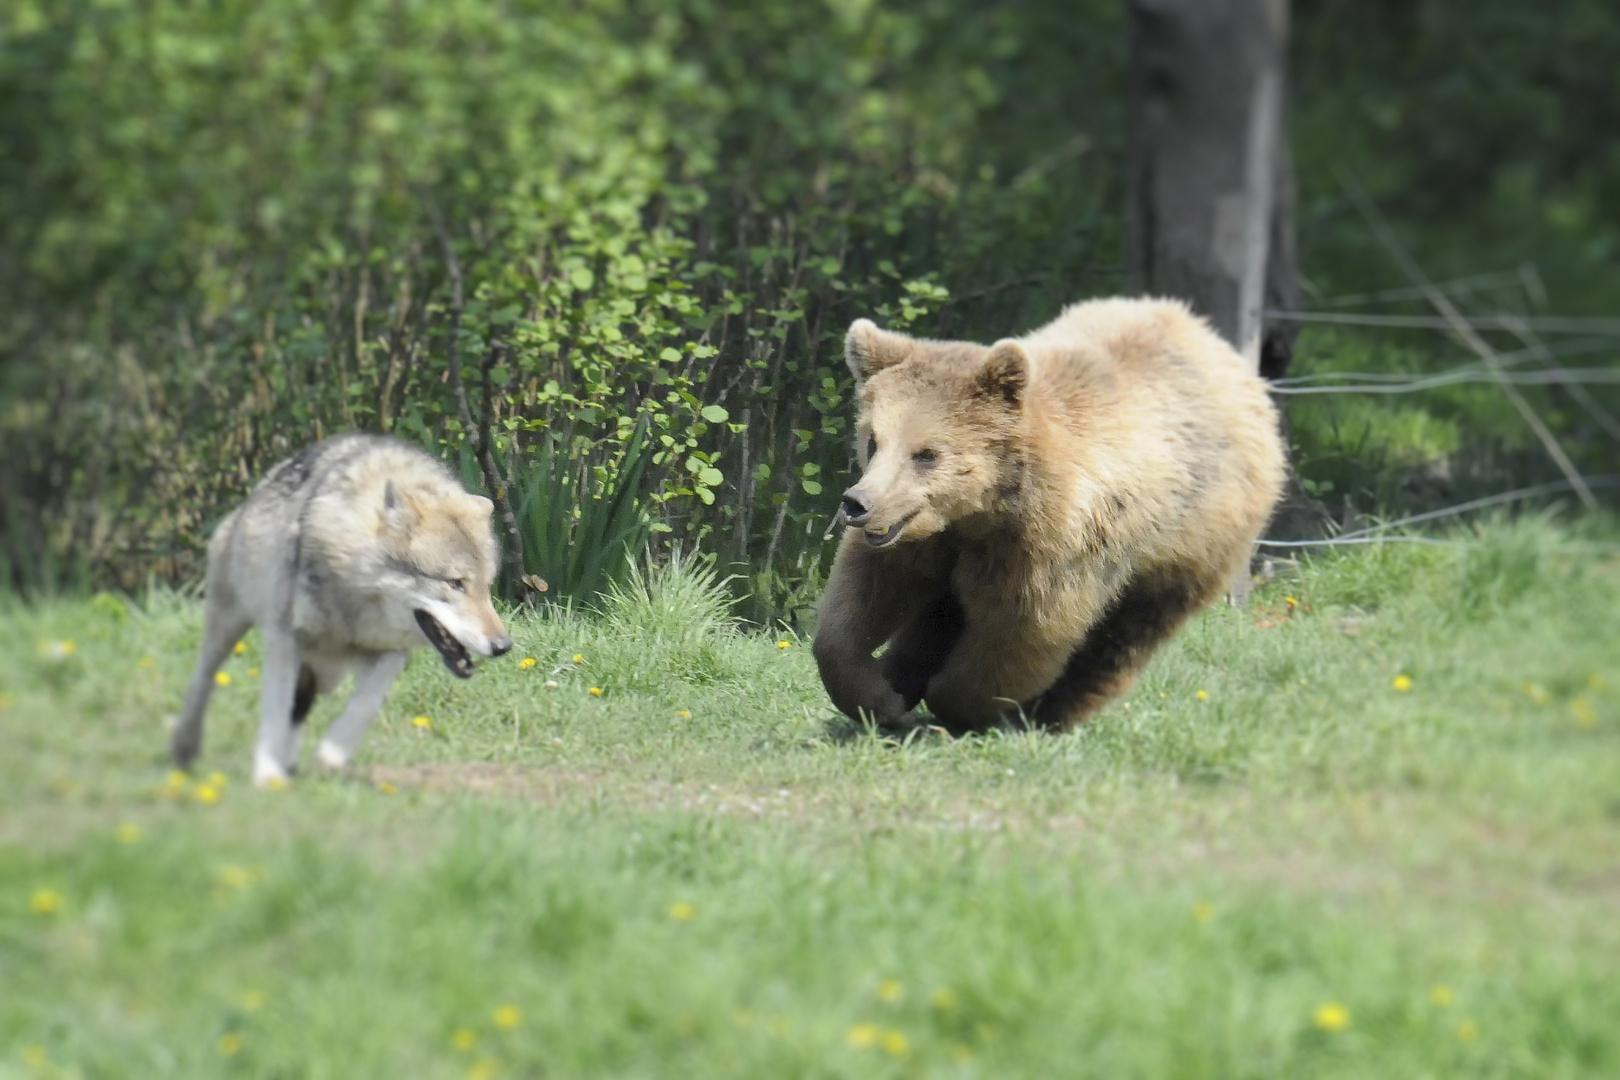 verkehrte Welt: Bär jagt Wolf